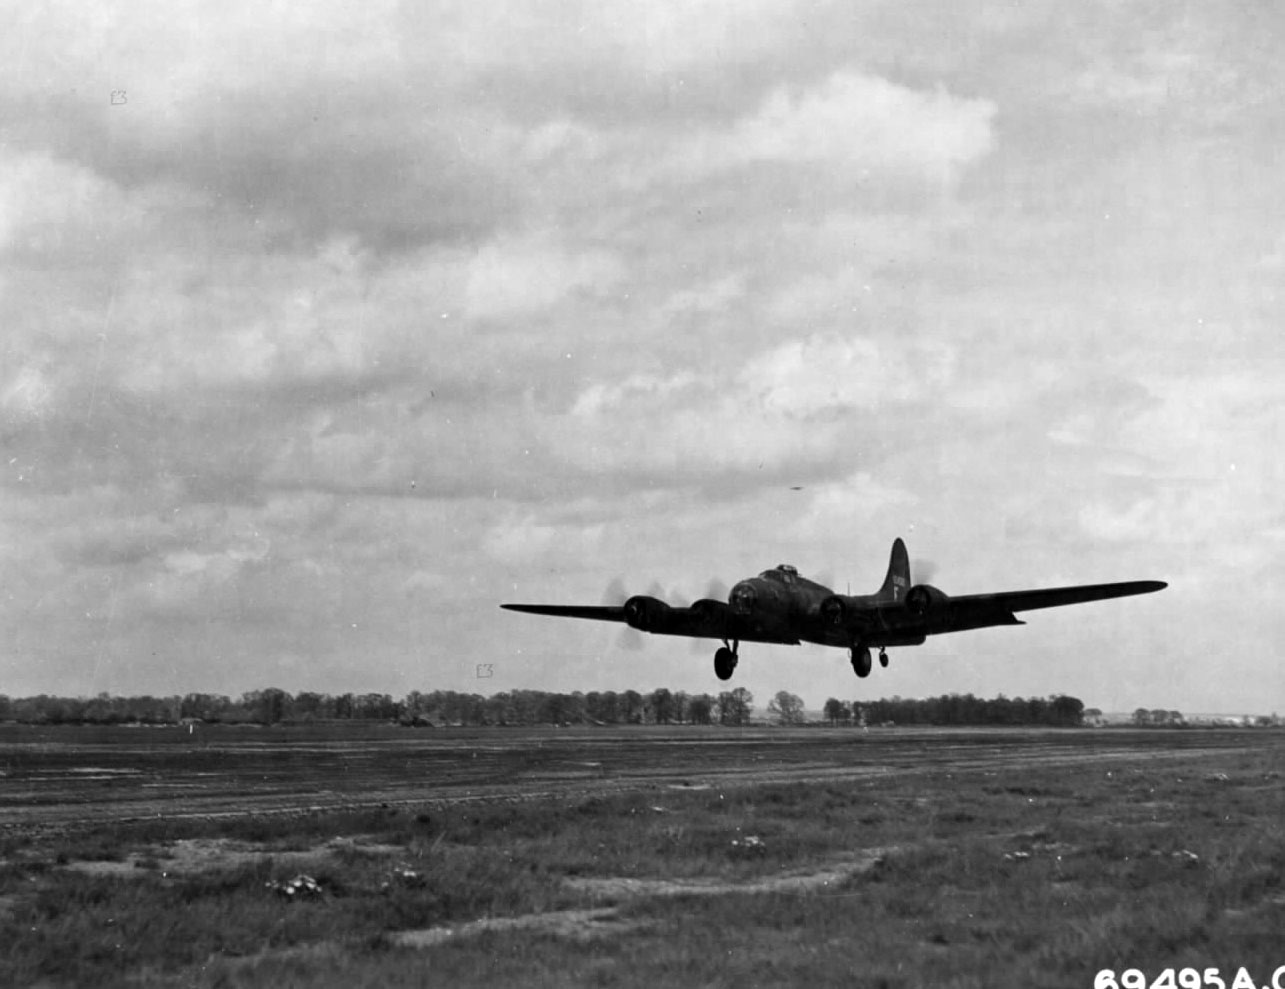 B-17 #41-24505 / Quitchurbitchin